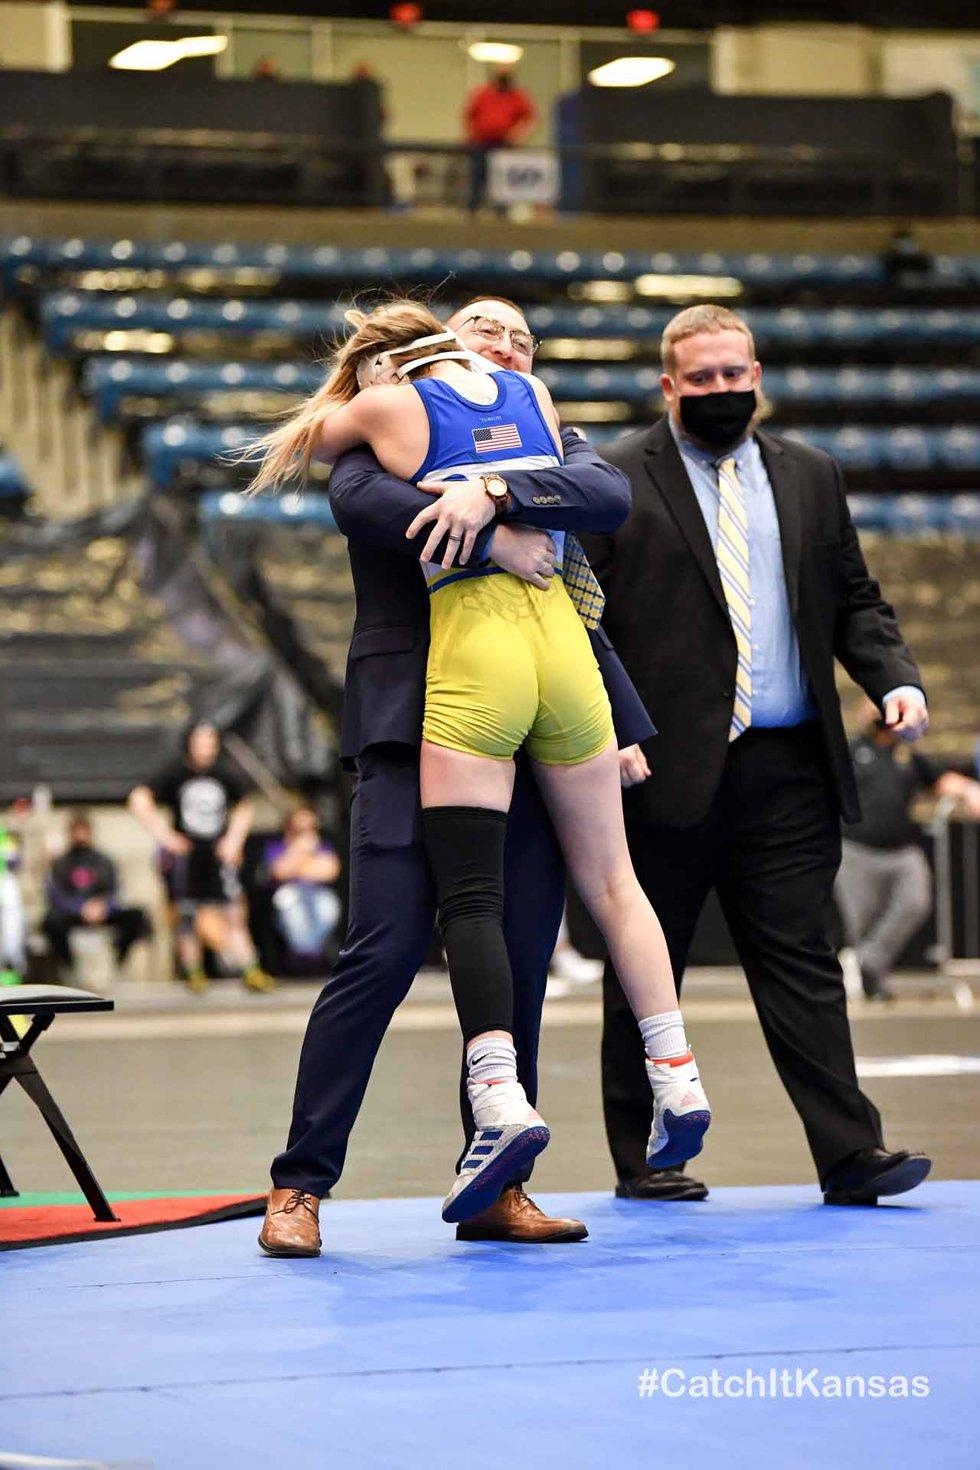 Feb 25, 2021; Wichita, Kansas, USA; during the Division I Girls State Wrestling Championships...